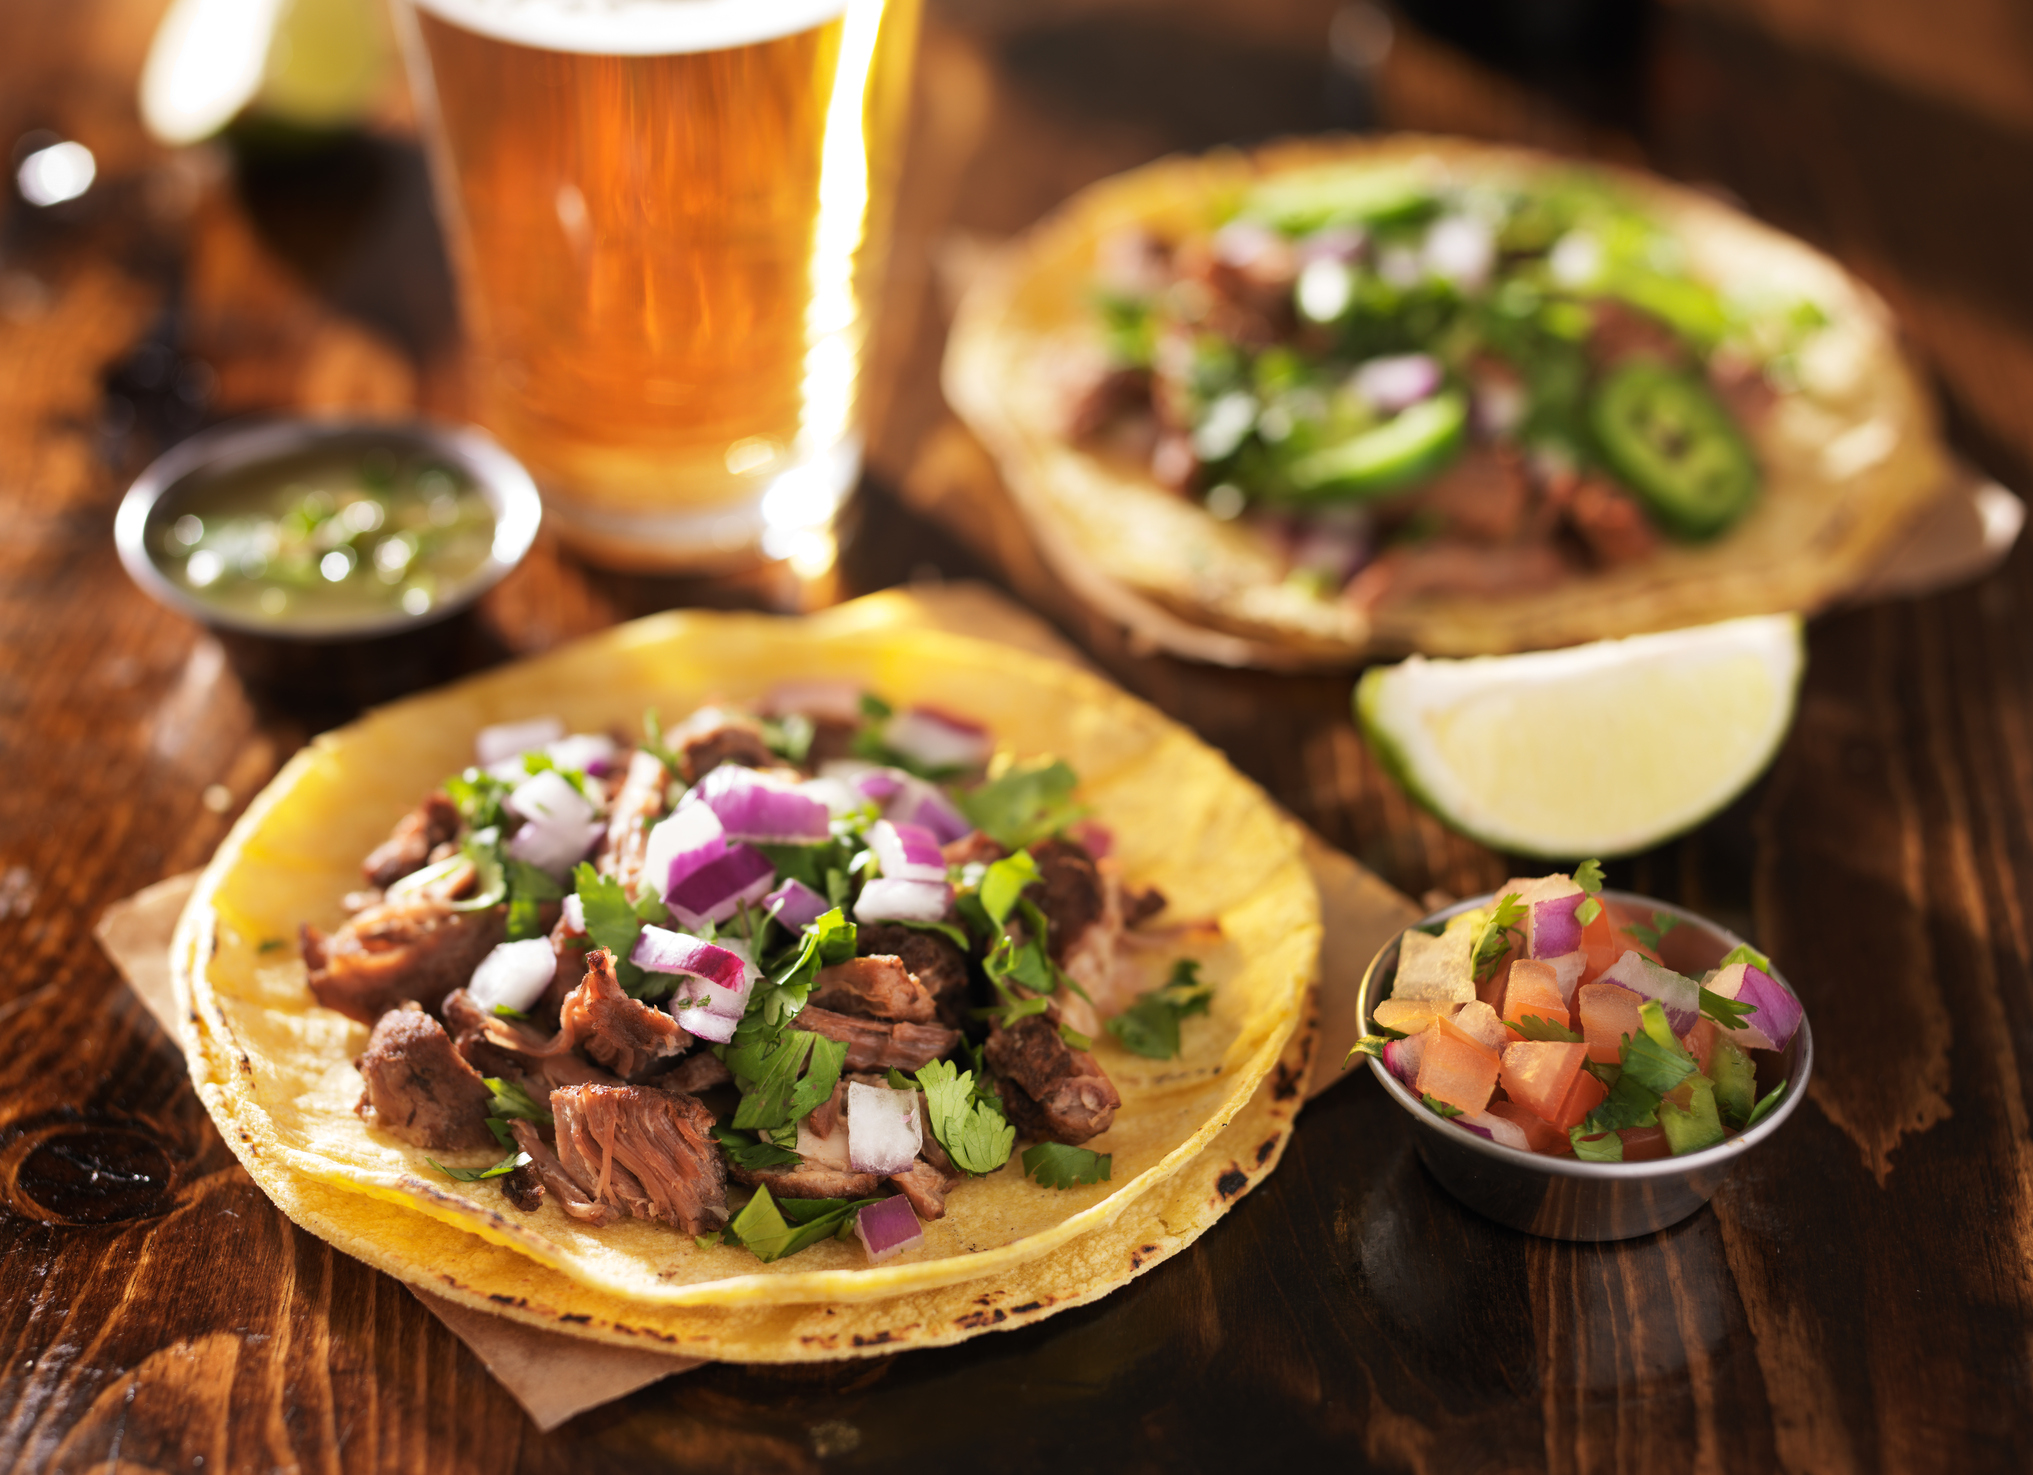 Mmmm, tacos. (Photo by Thinkstock)